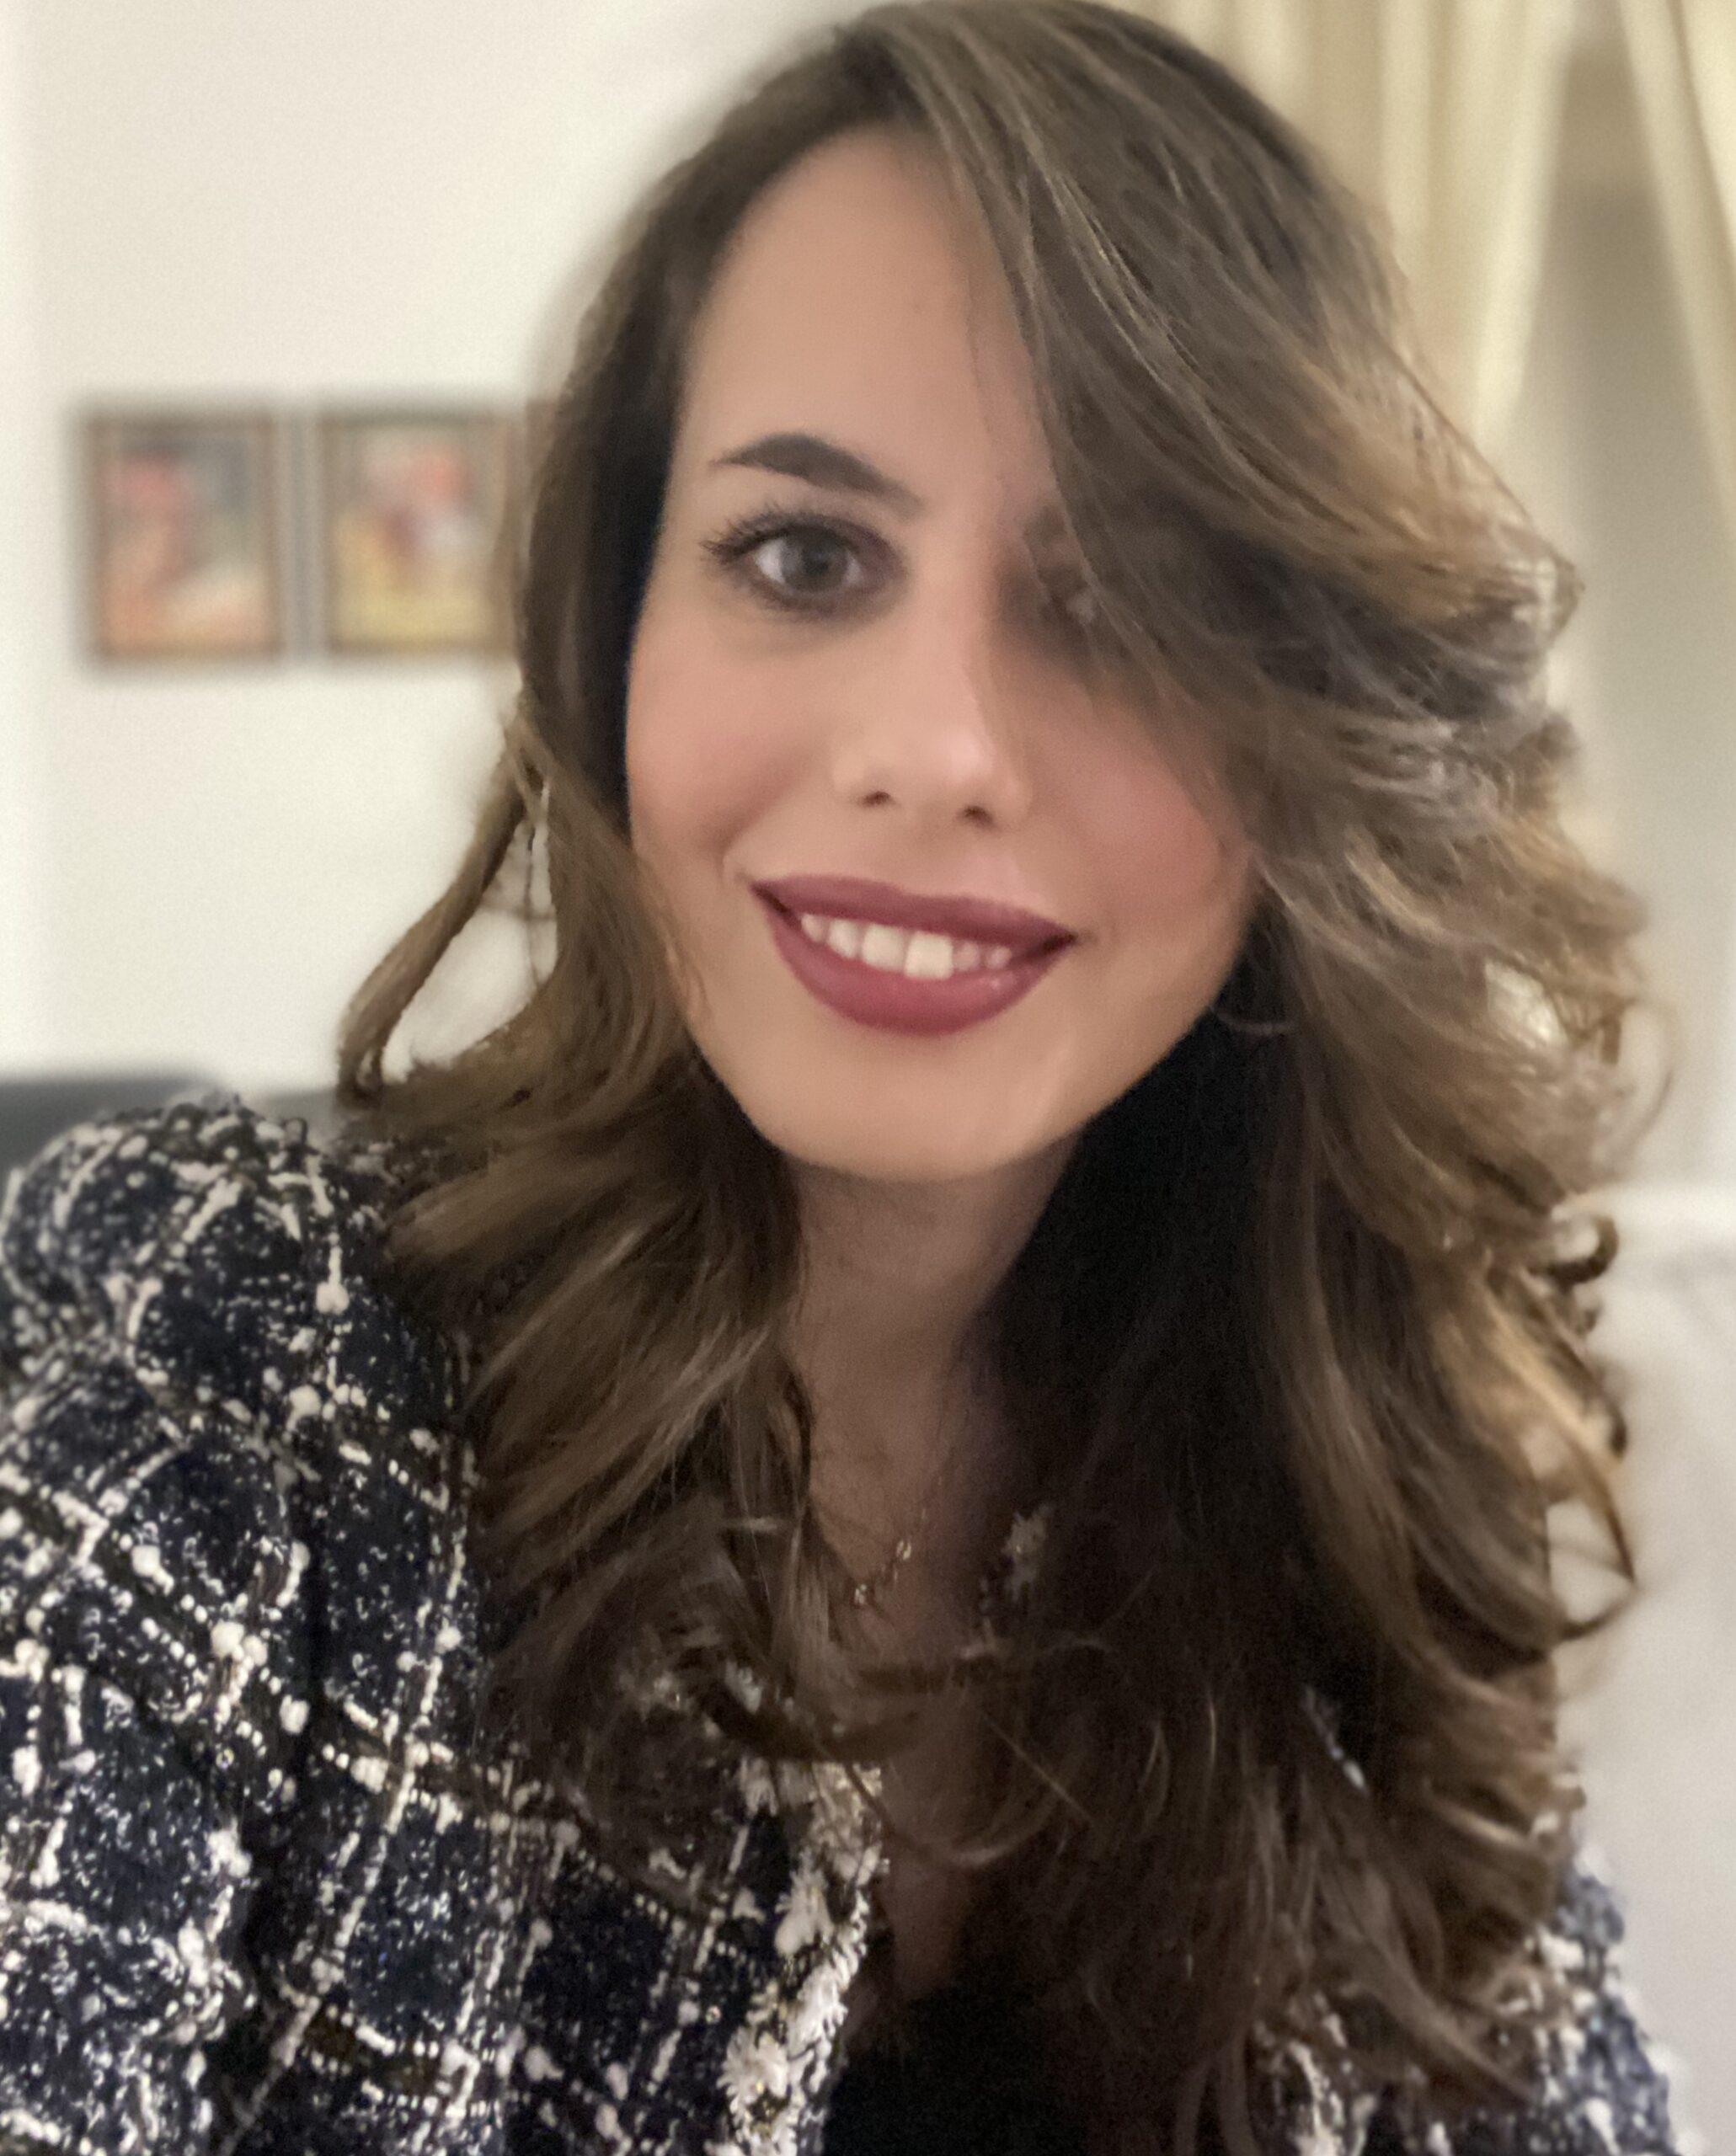 Dott.ssa Francesca Delli Santi